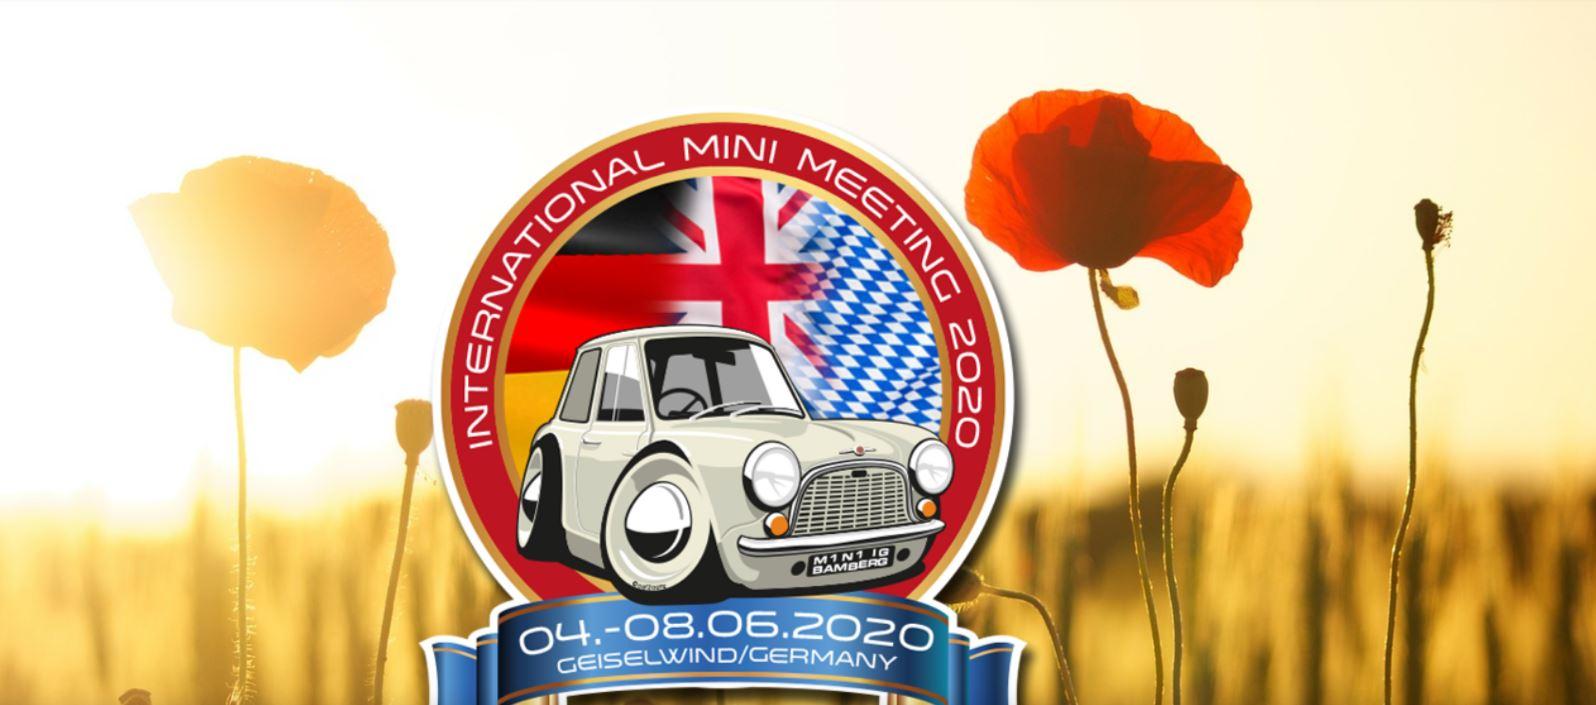 International Mini Meeting 2020